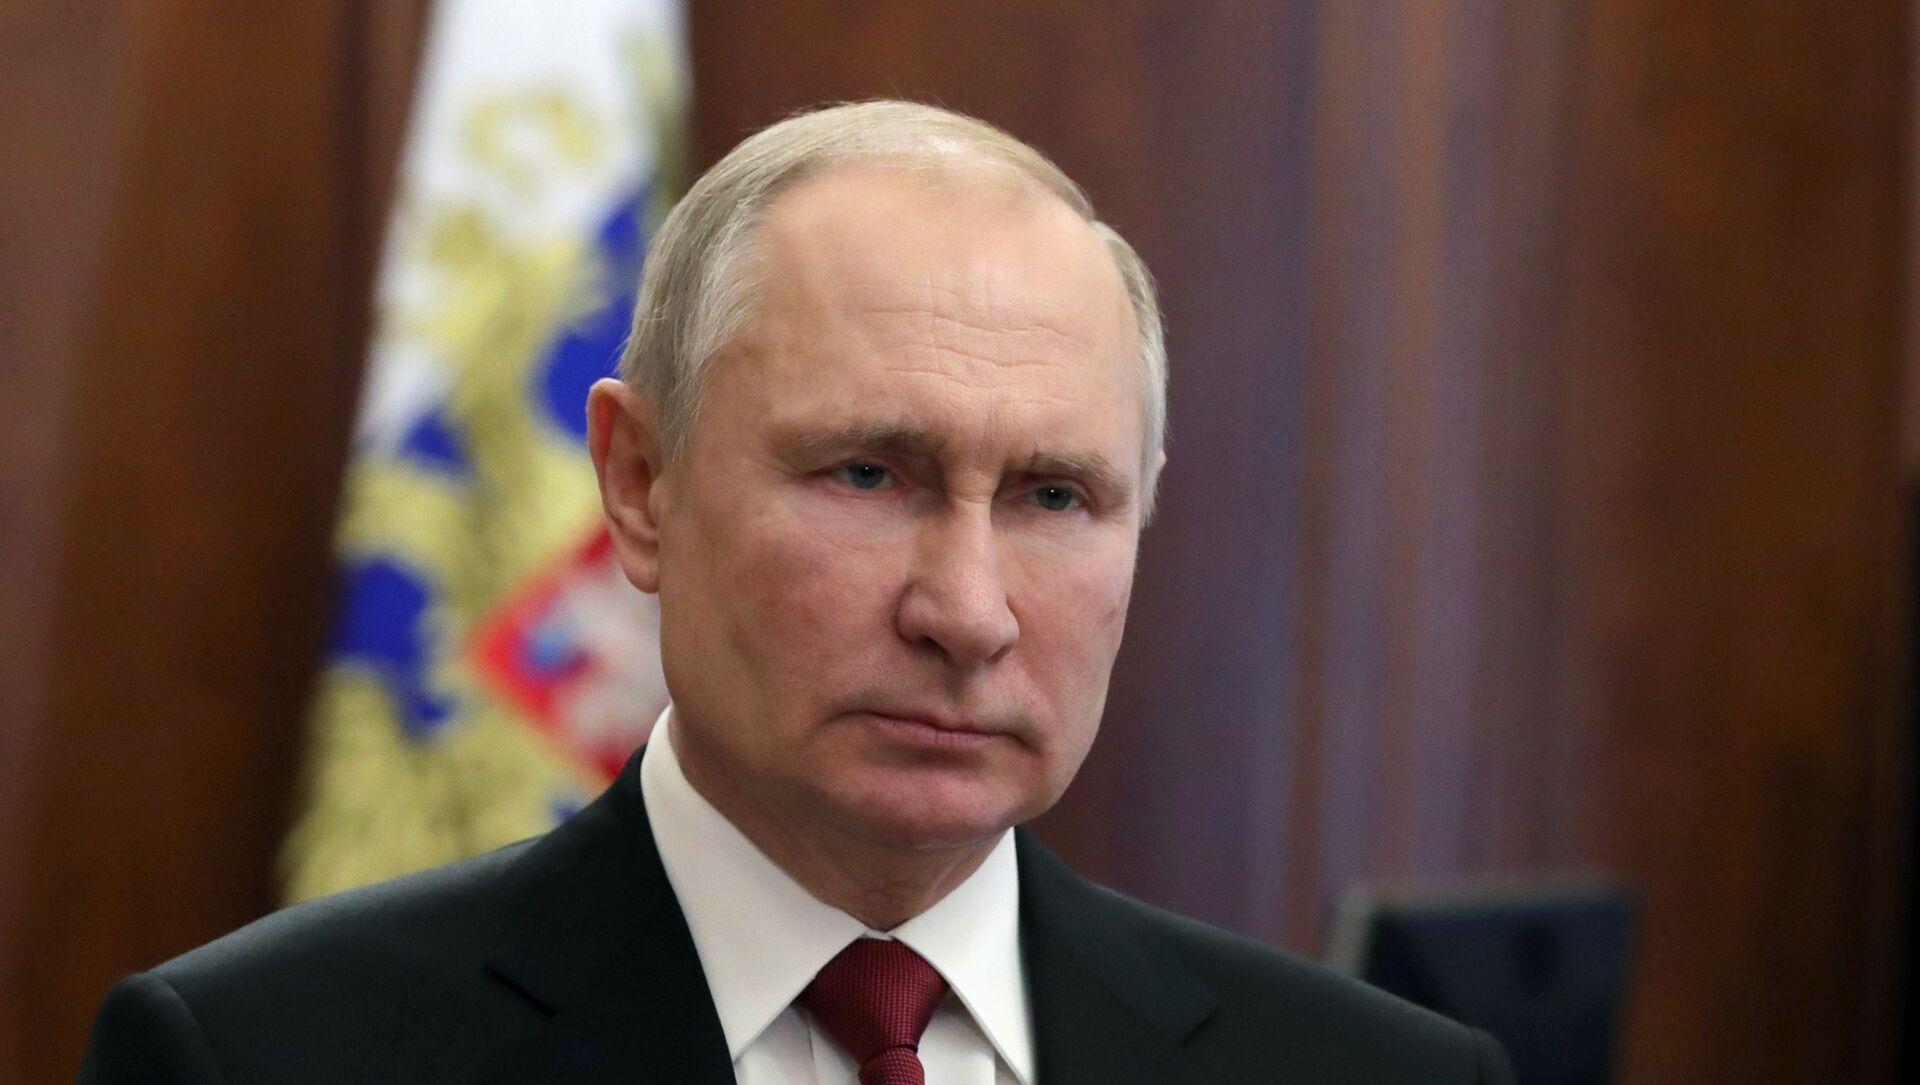 Prezydent Rosji Władimir Putin. - Sputnik Polska, 1920, 11.03.2021